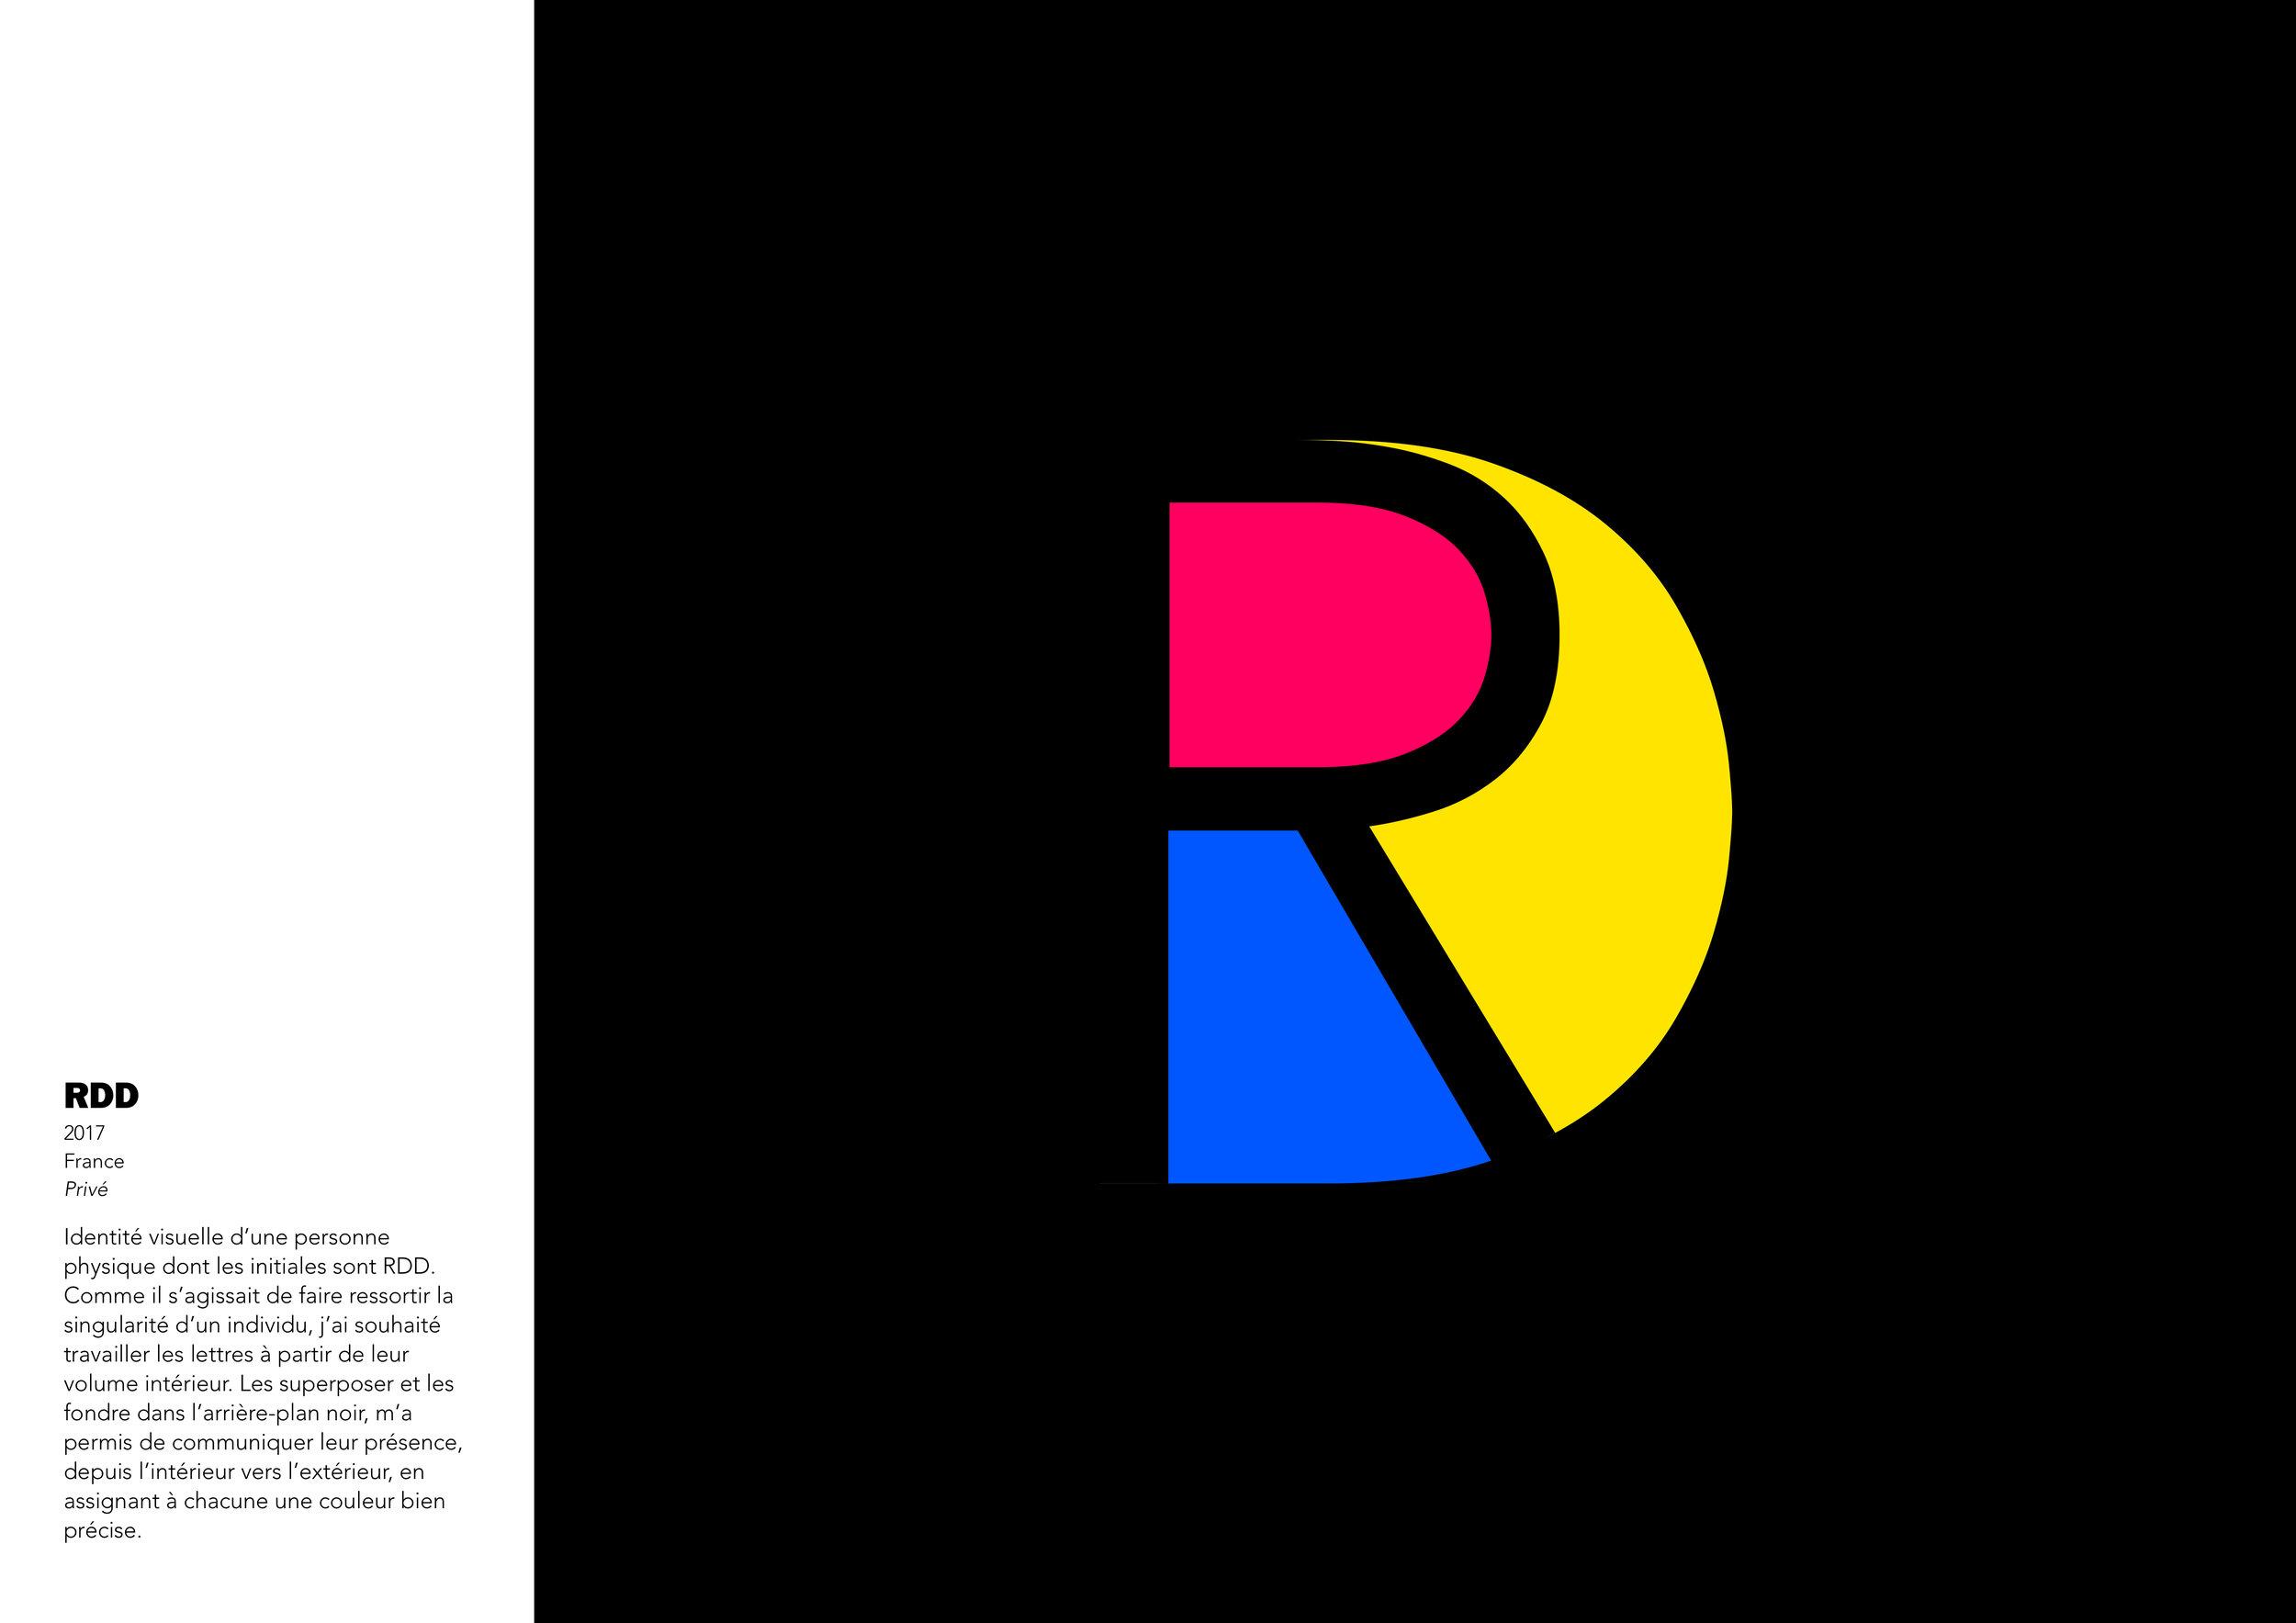 RDD-monogram-logo-design-joy-lasry.jpg